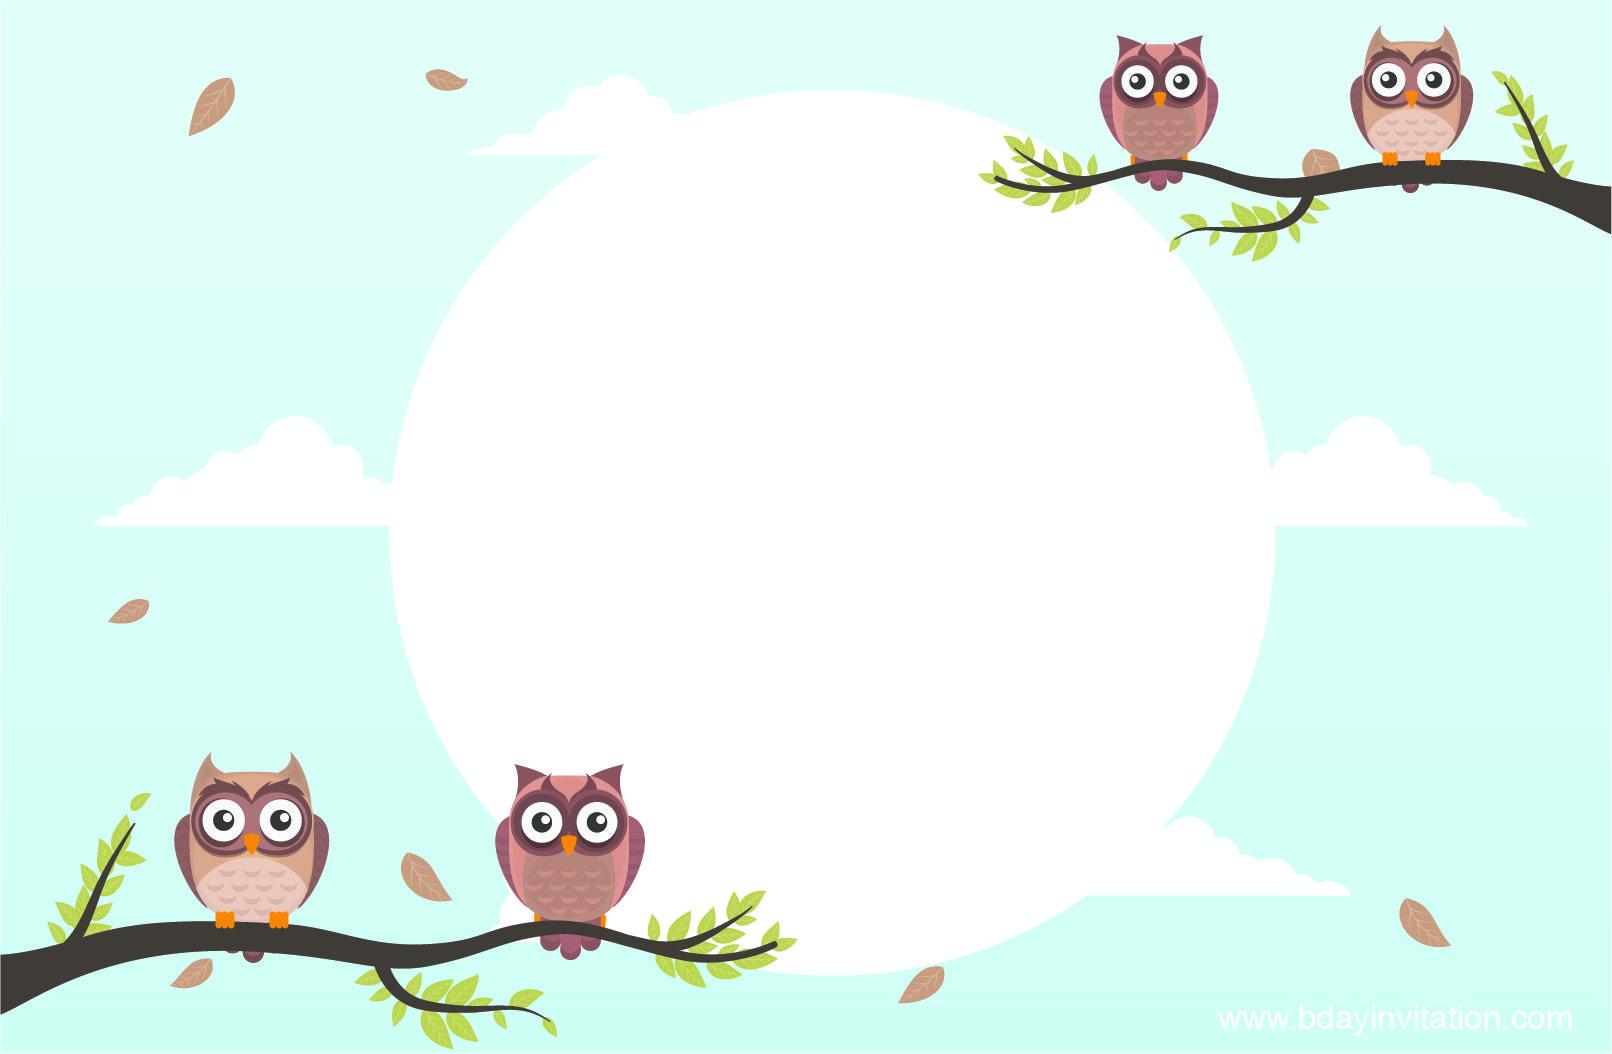 Cool FREE Printable Owl Birthday Invitation Template | FREE ...